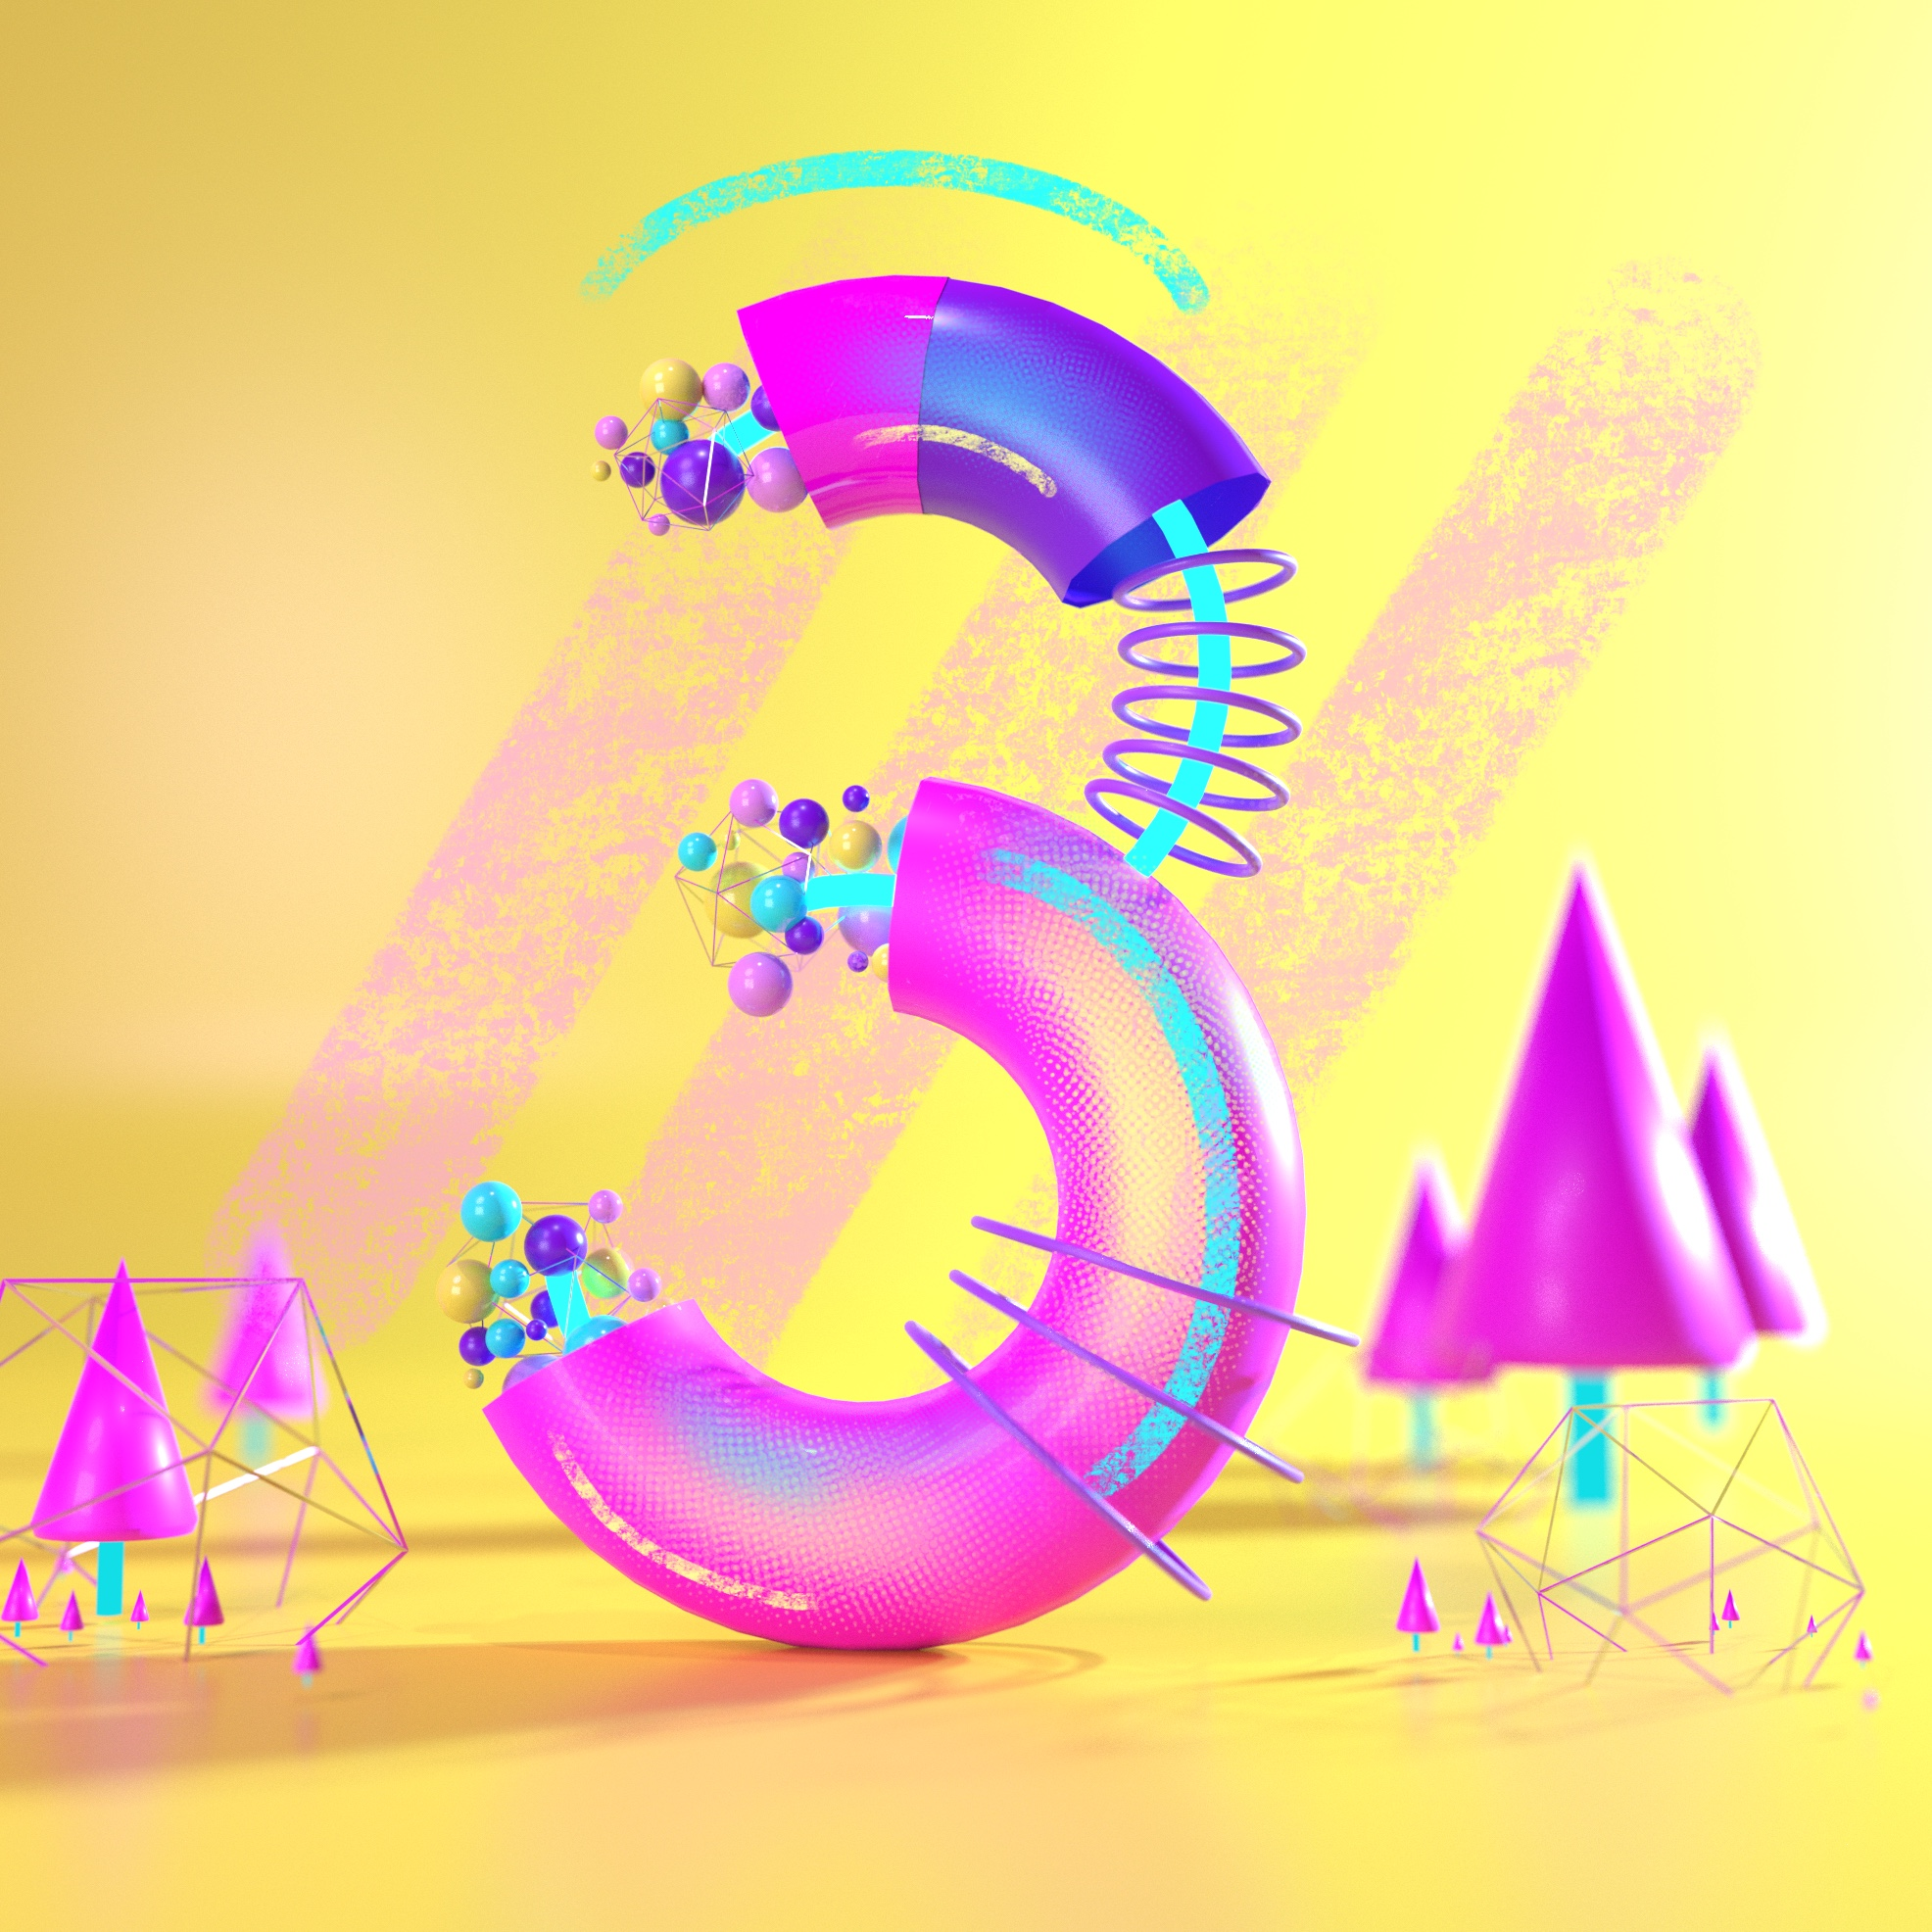 chris winterton 36 days of type 3